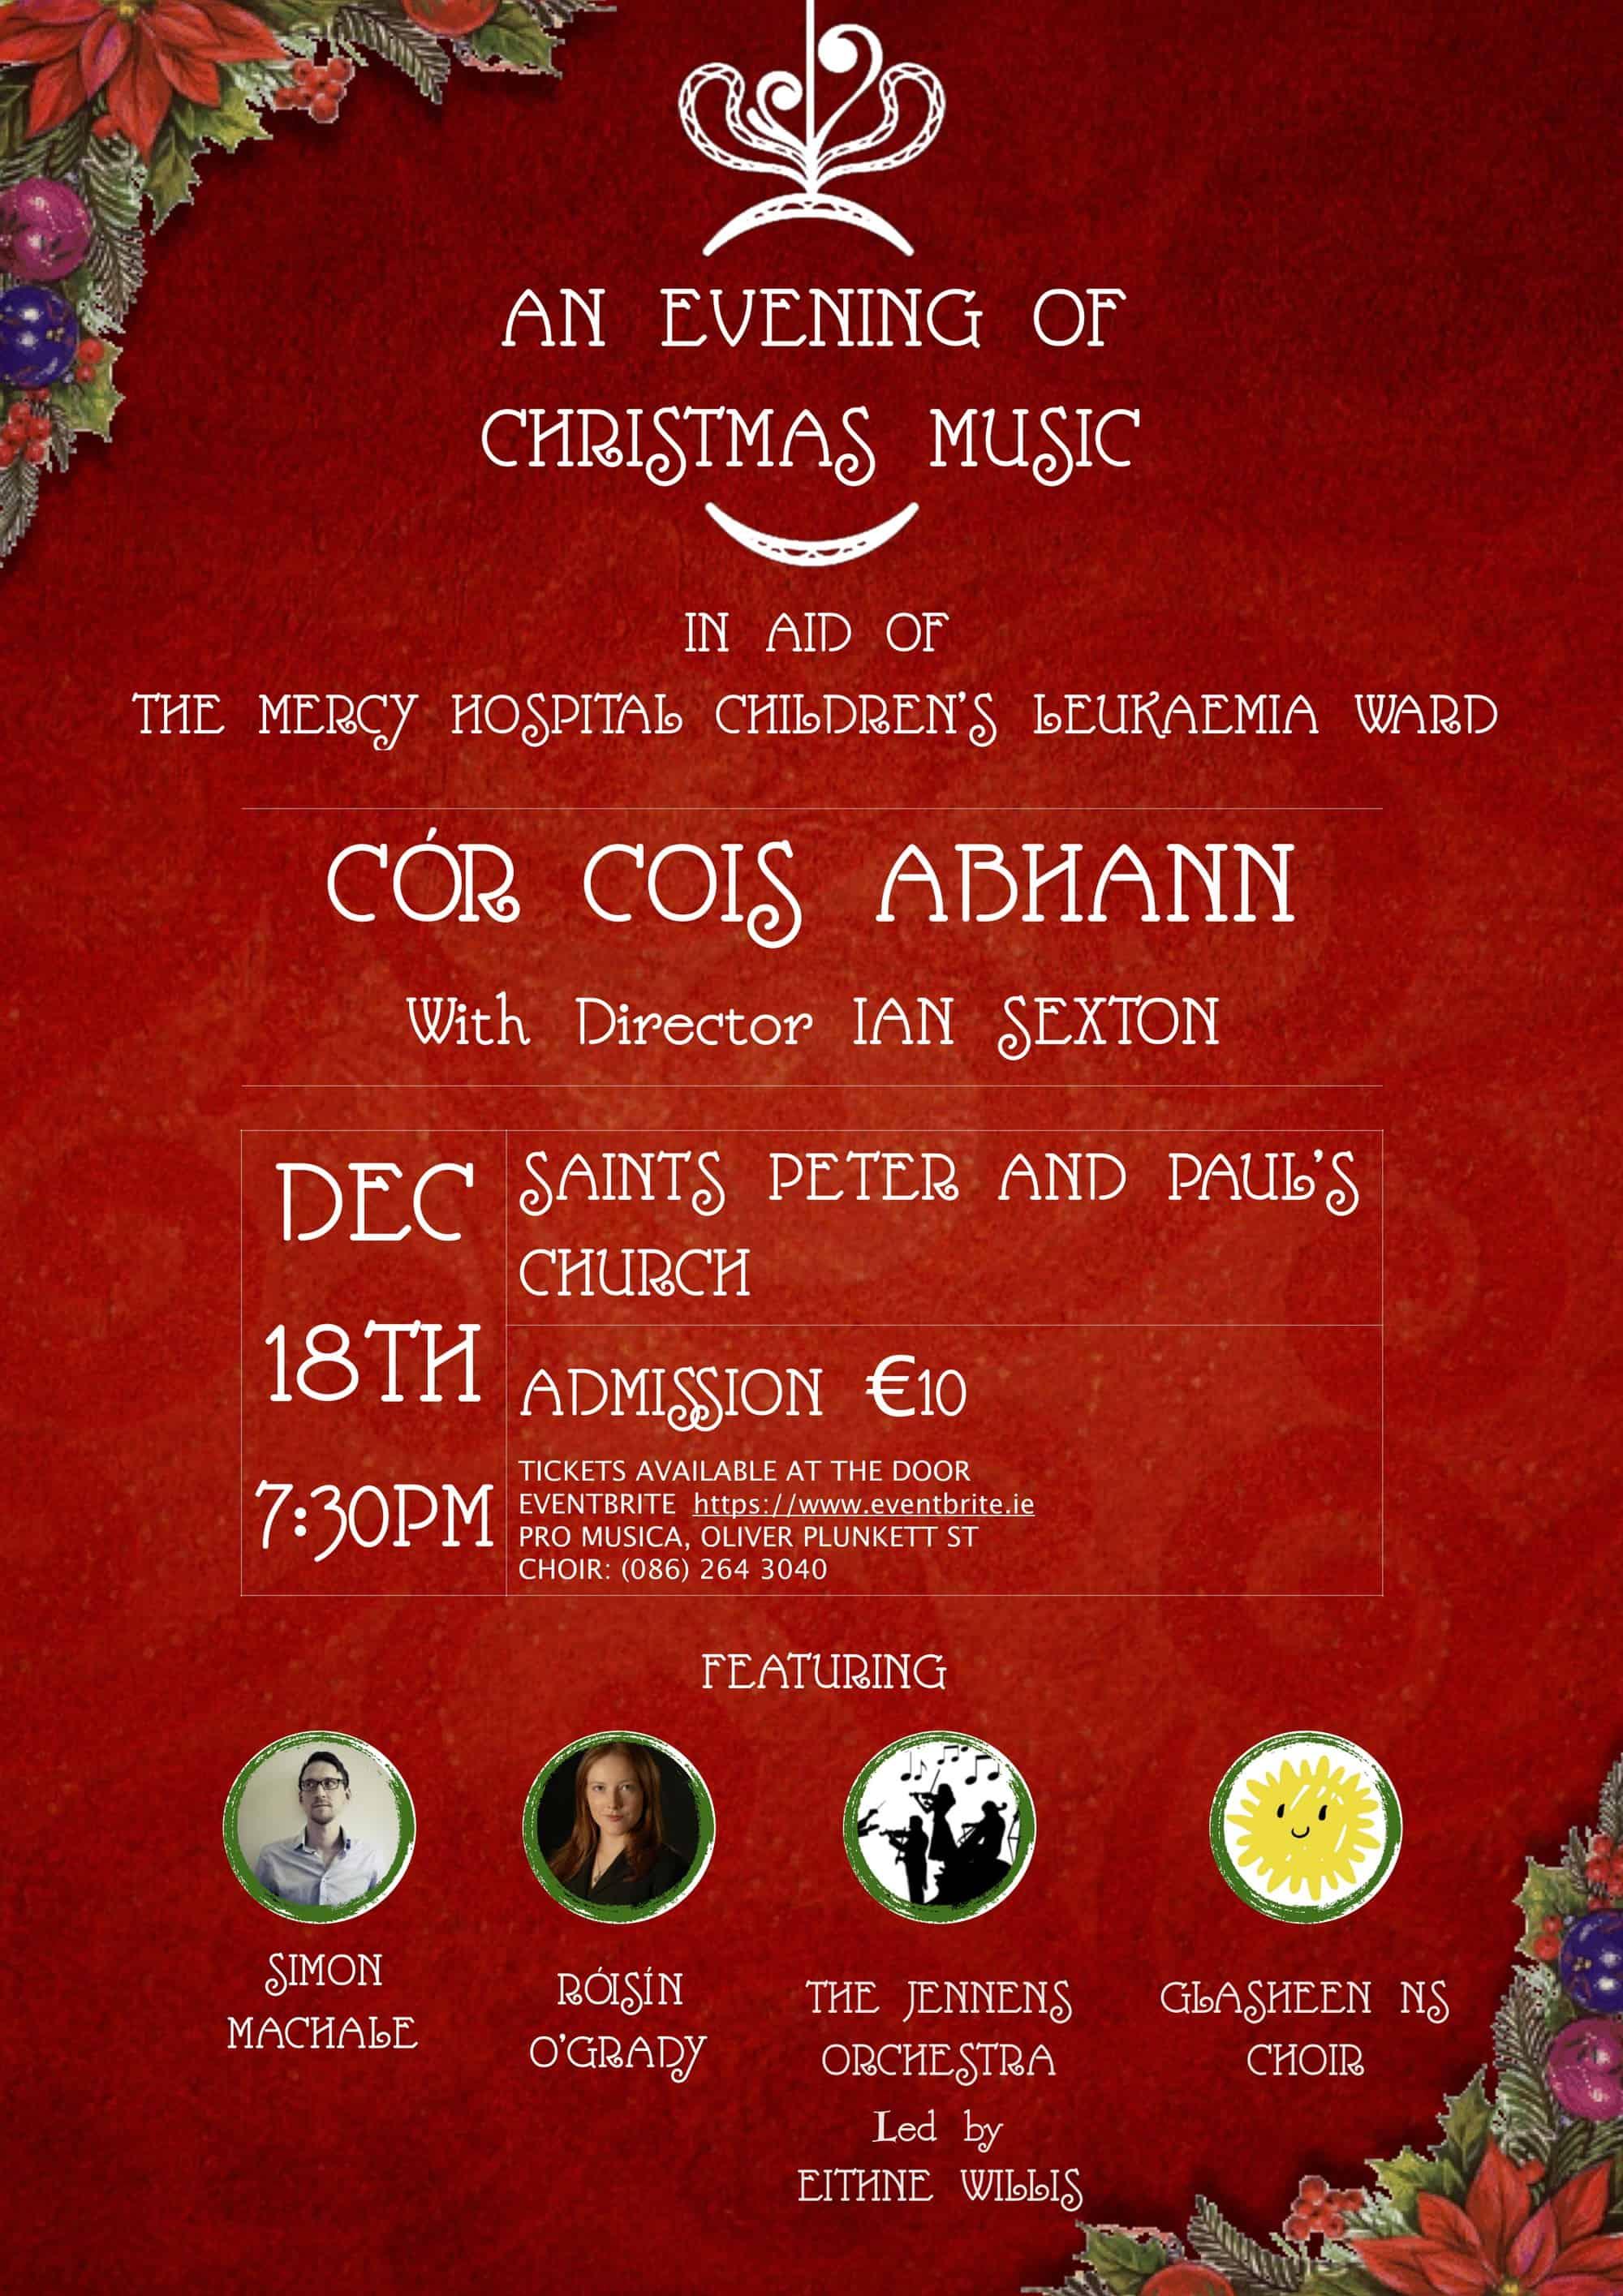 Cór Cois Abhann, a Cork City based choir, invite you to an Evening of Christmas Music at Saints Peter and Pauls Church Cork on December 18th.